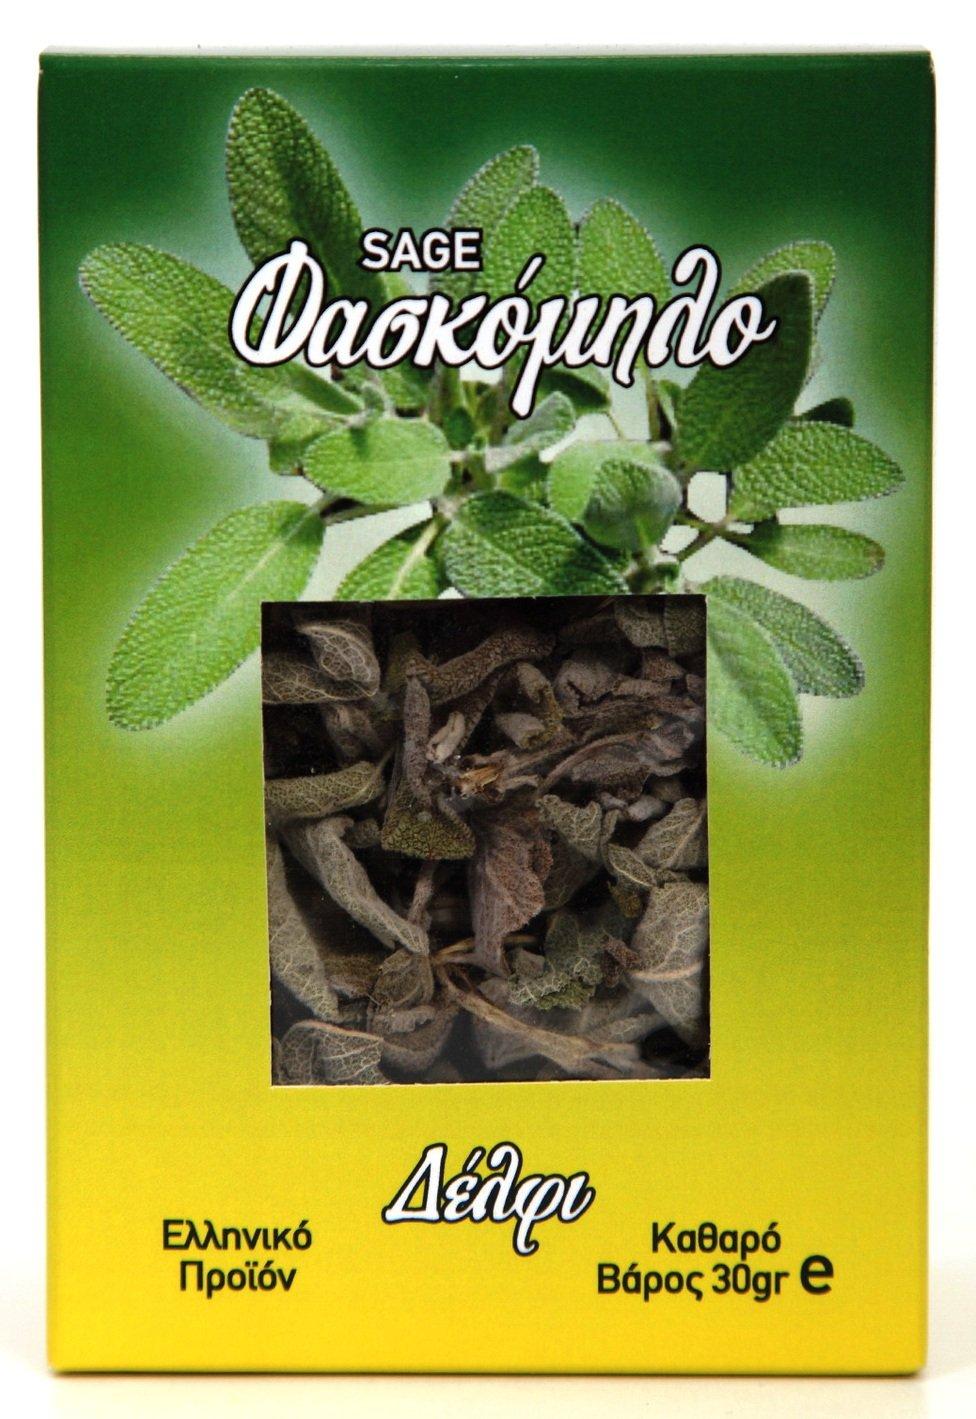 Sage Faskomilo Delphi 30gr 1.06oz Greek Product